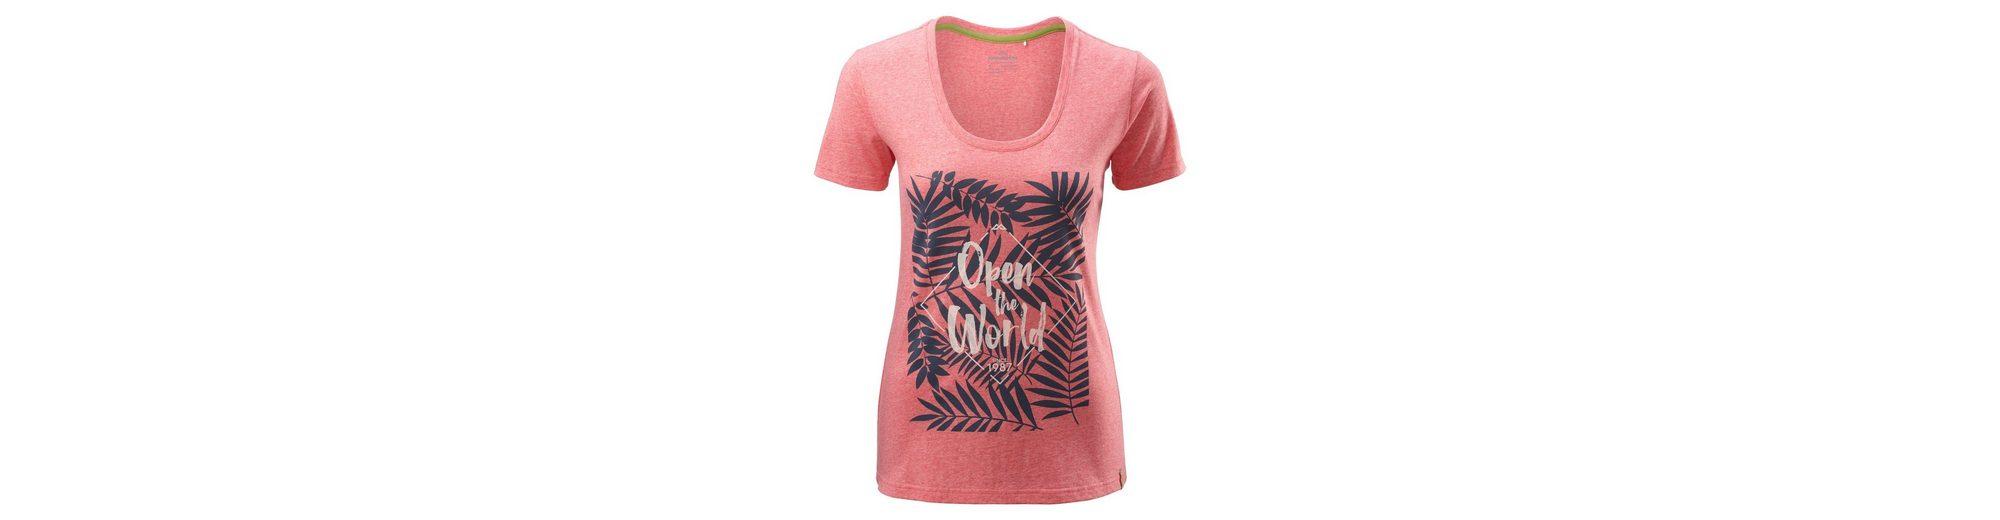 Kathmandu T-Shirt mit Print Freies Verschiffen Größte Lieferant Auftrag kT5nrky